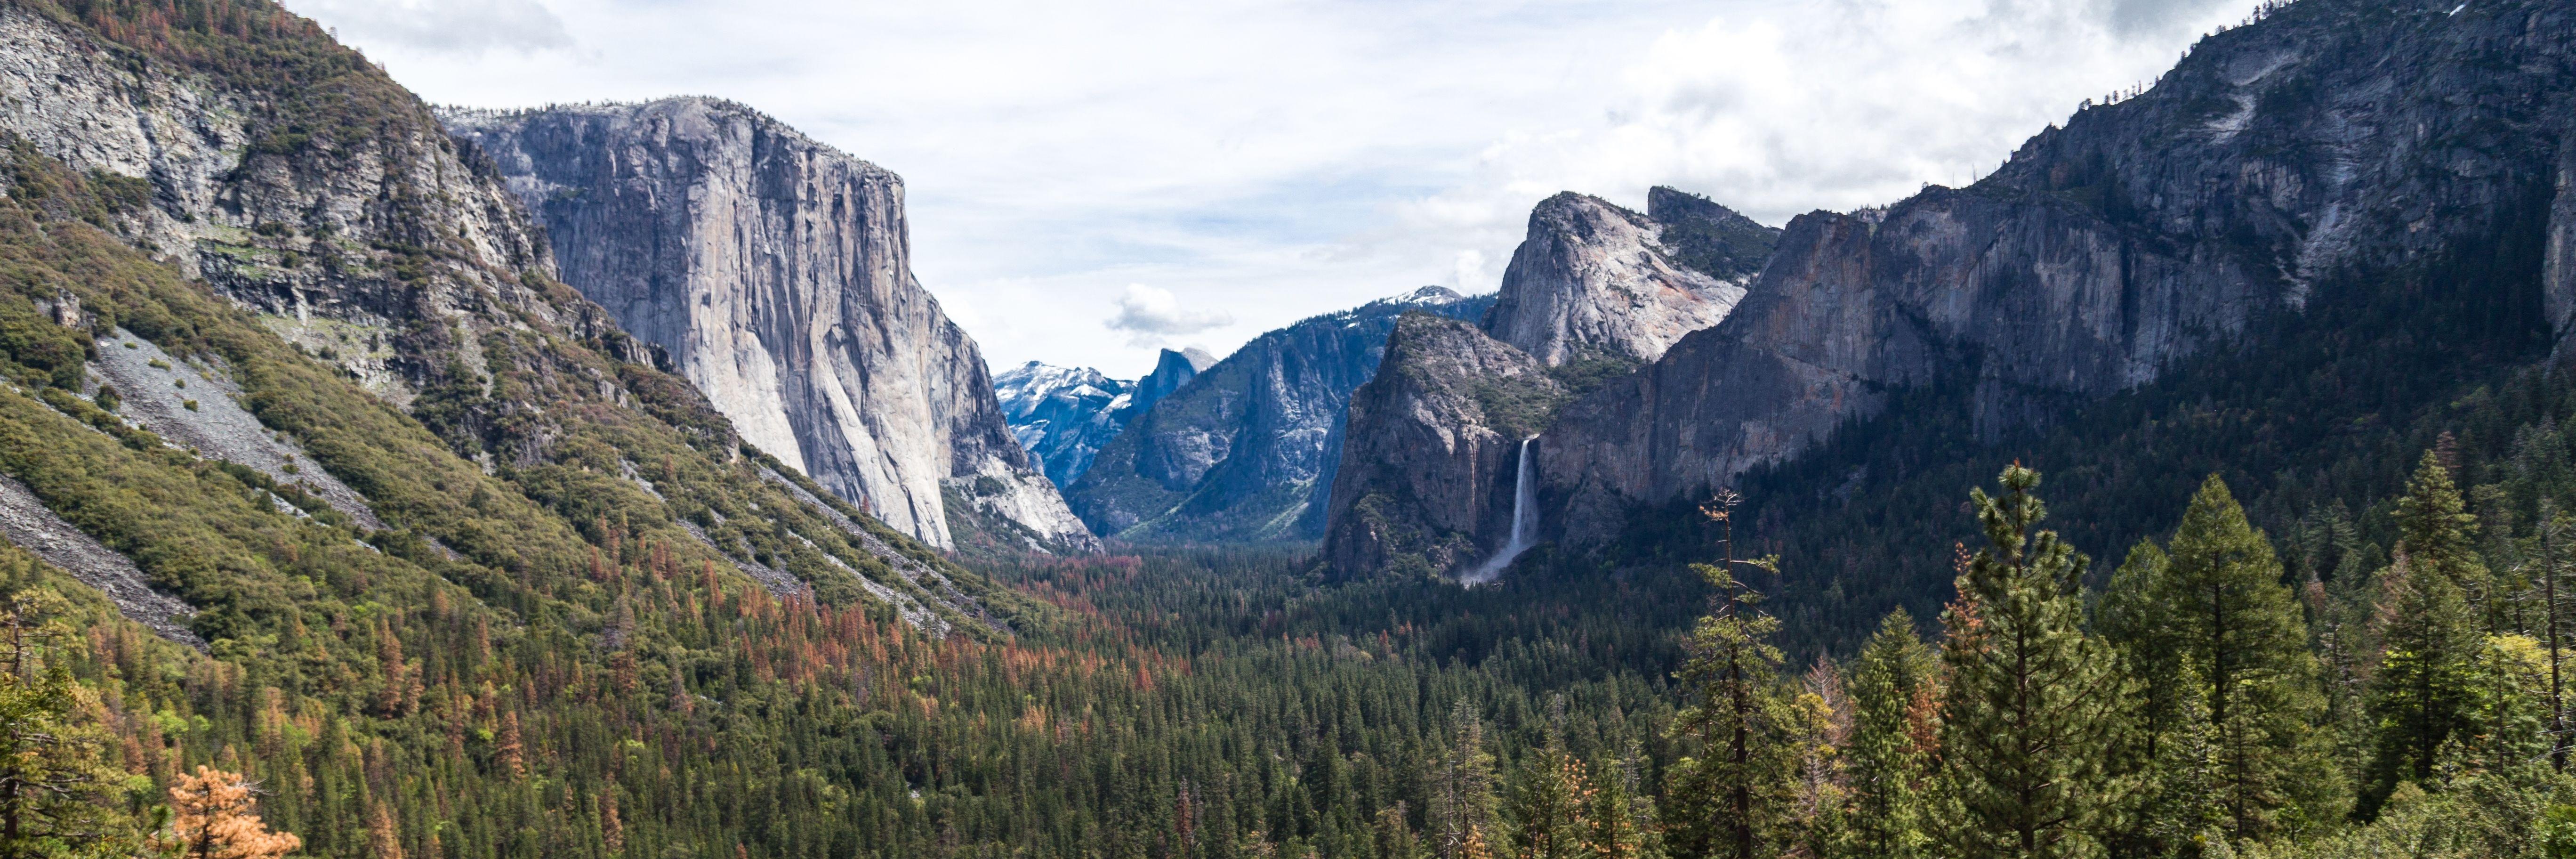 Yosemite Transportation From Sam Francisco